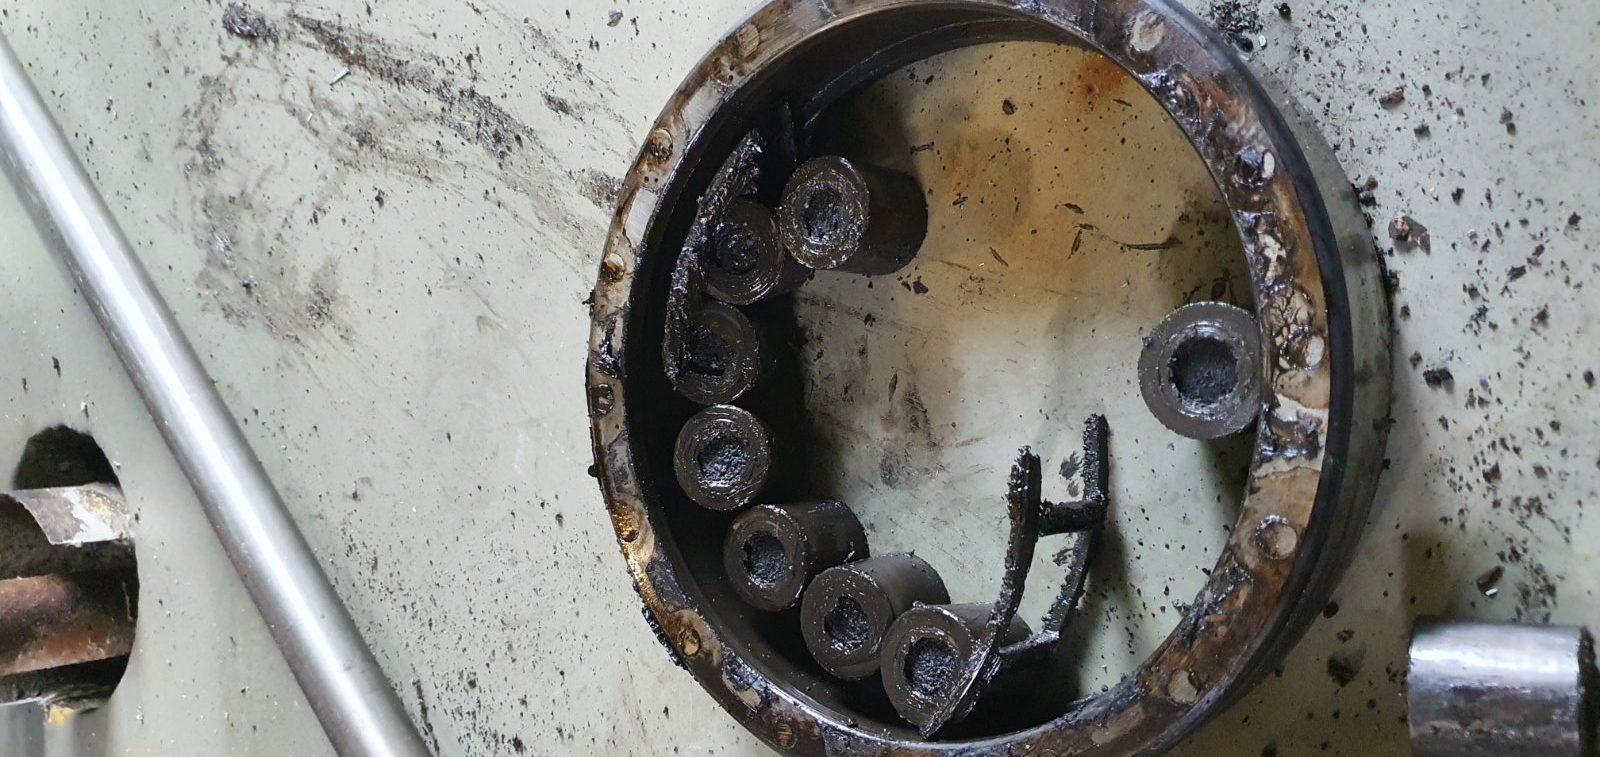 Выход из строя подшипника на двигателе 500 кВт